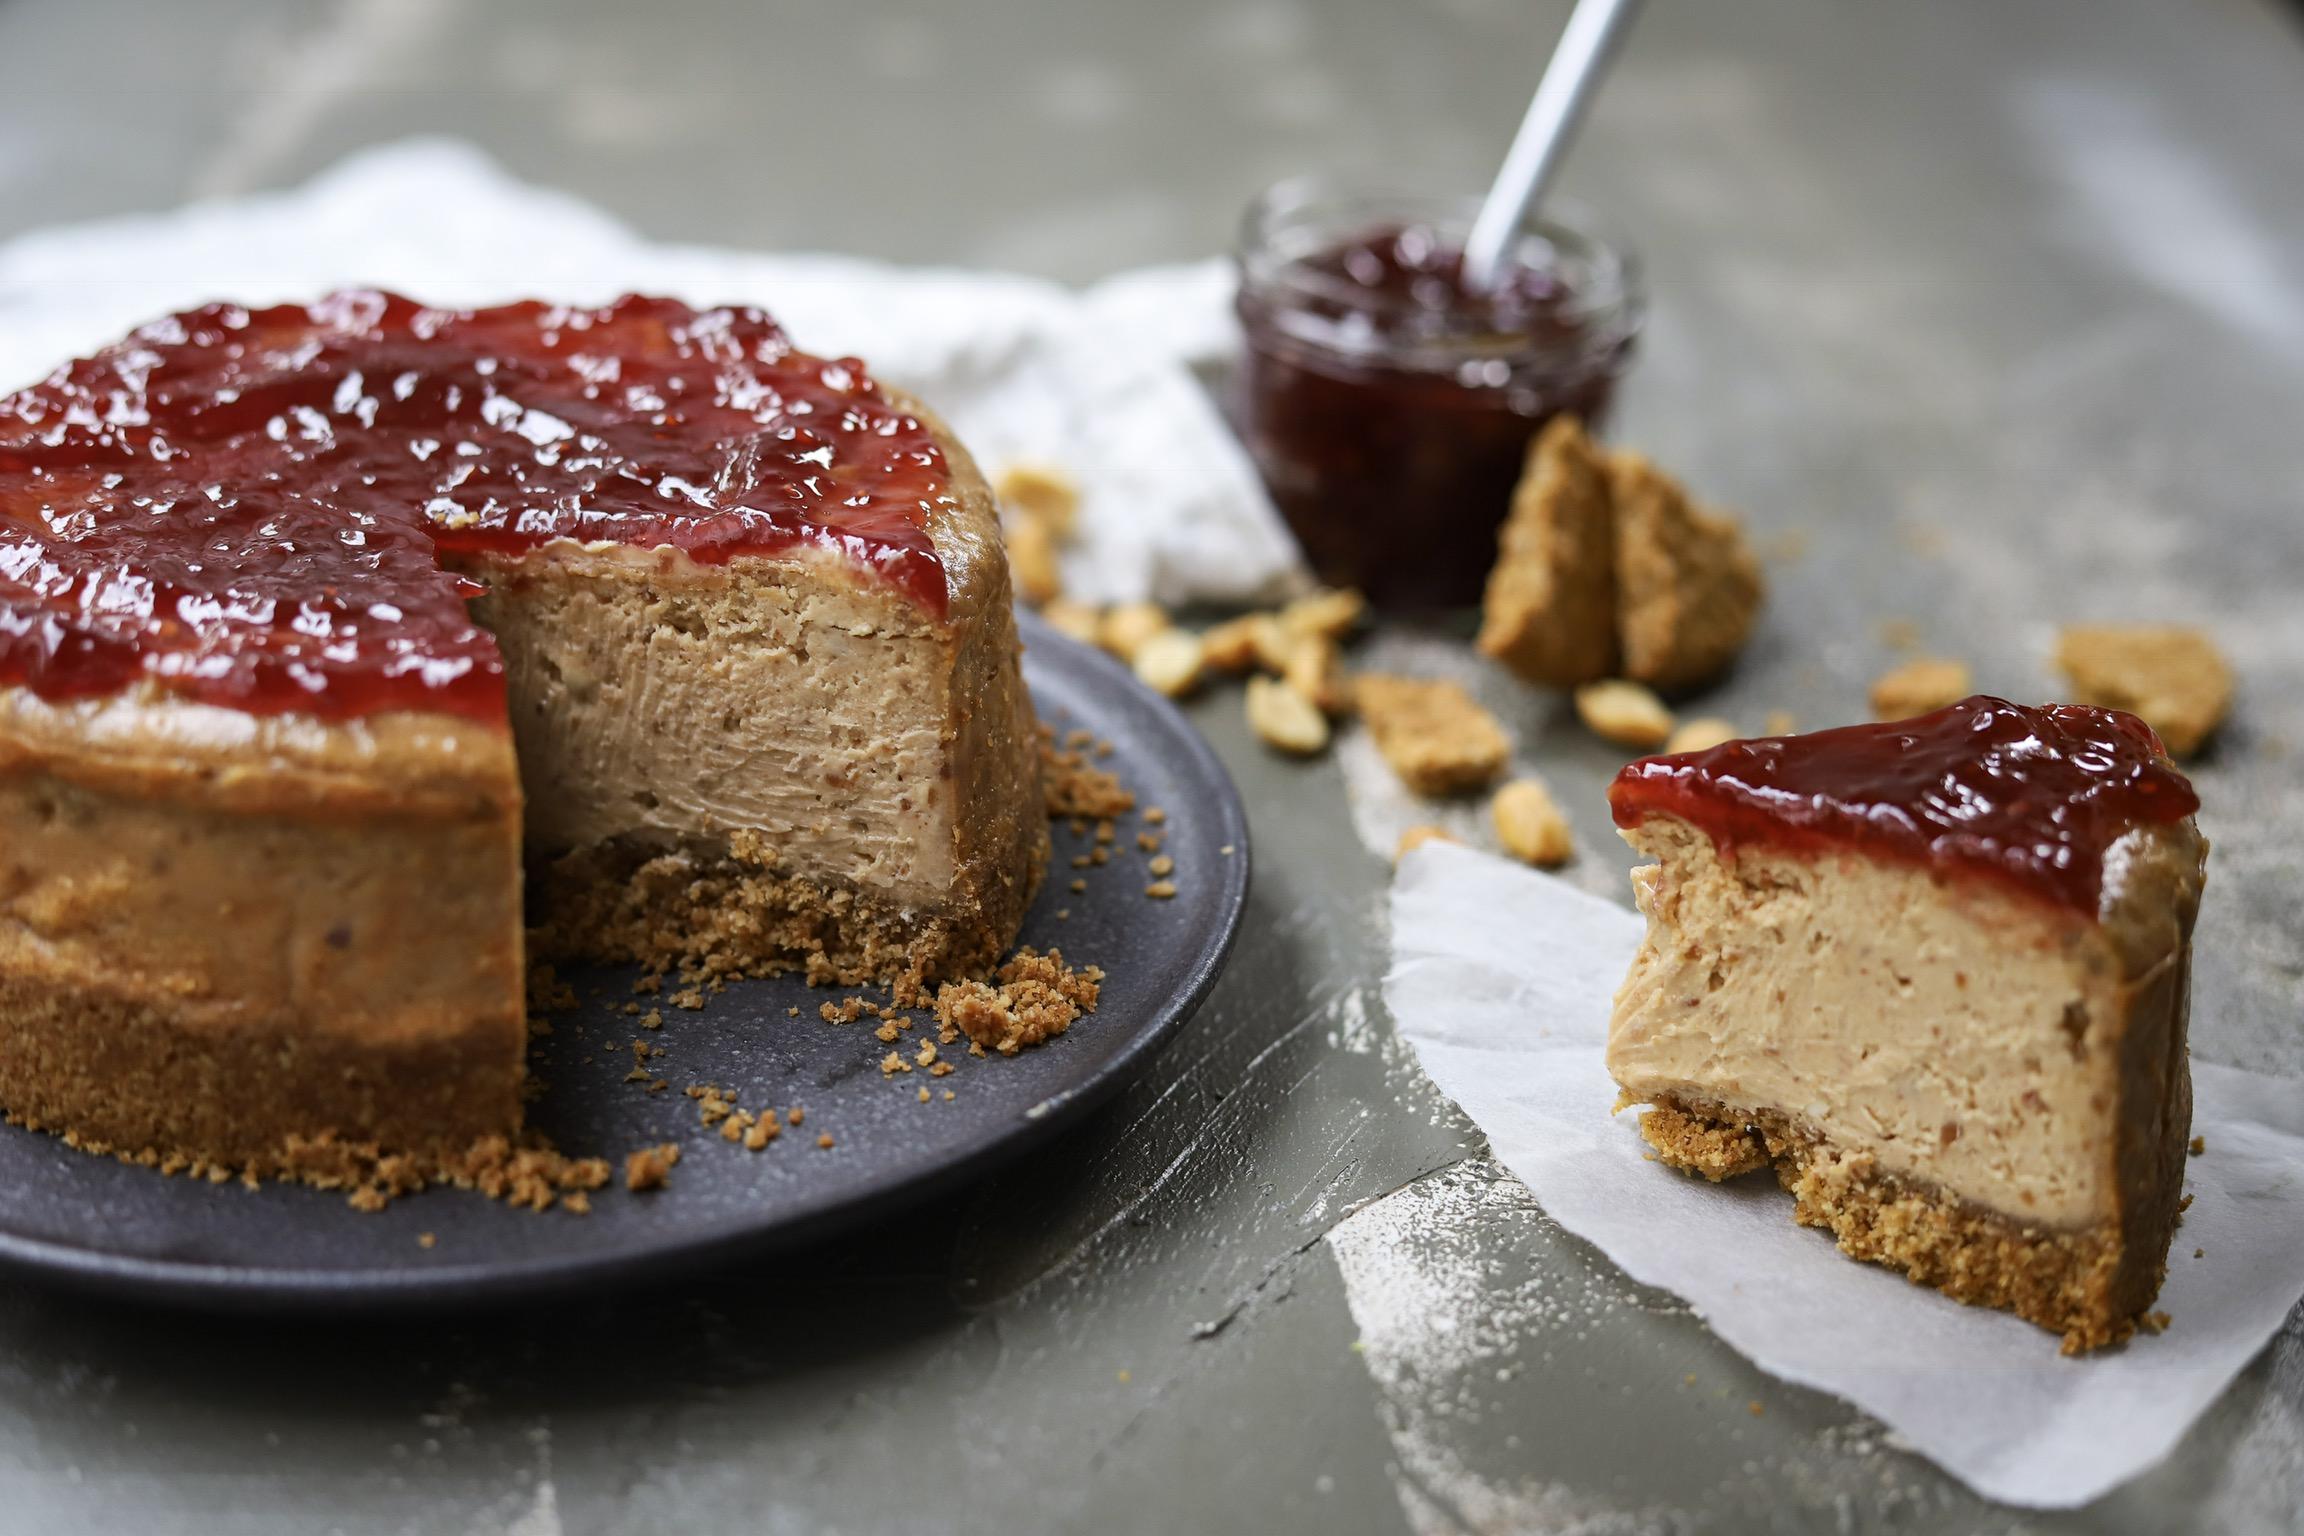 Peanutbutter jelly cheesecake